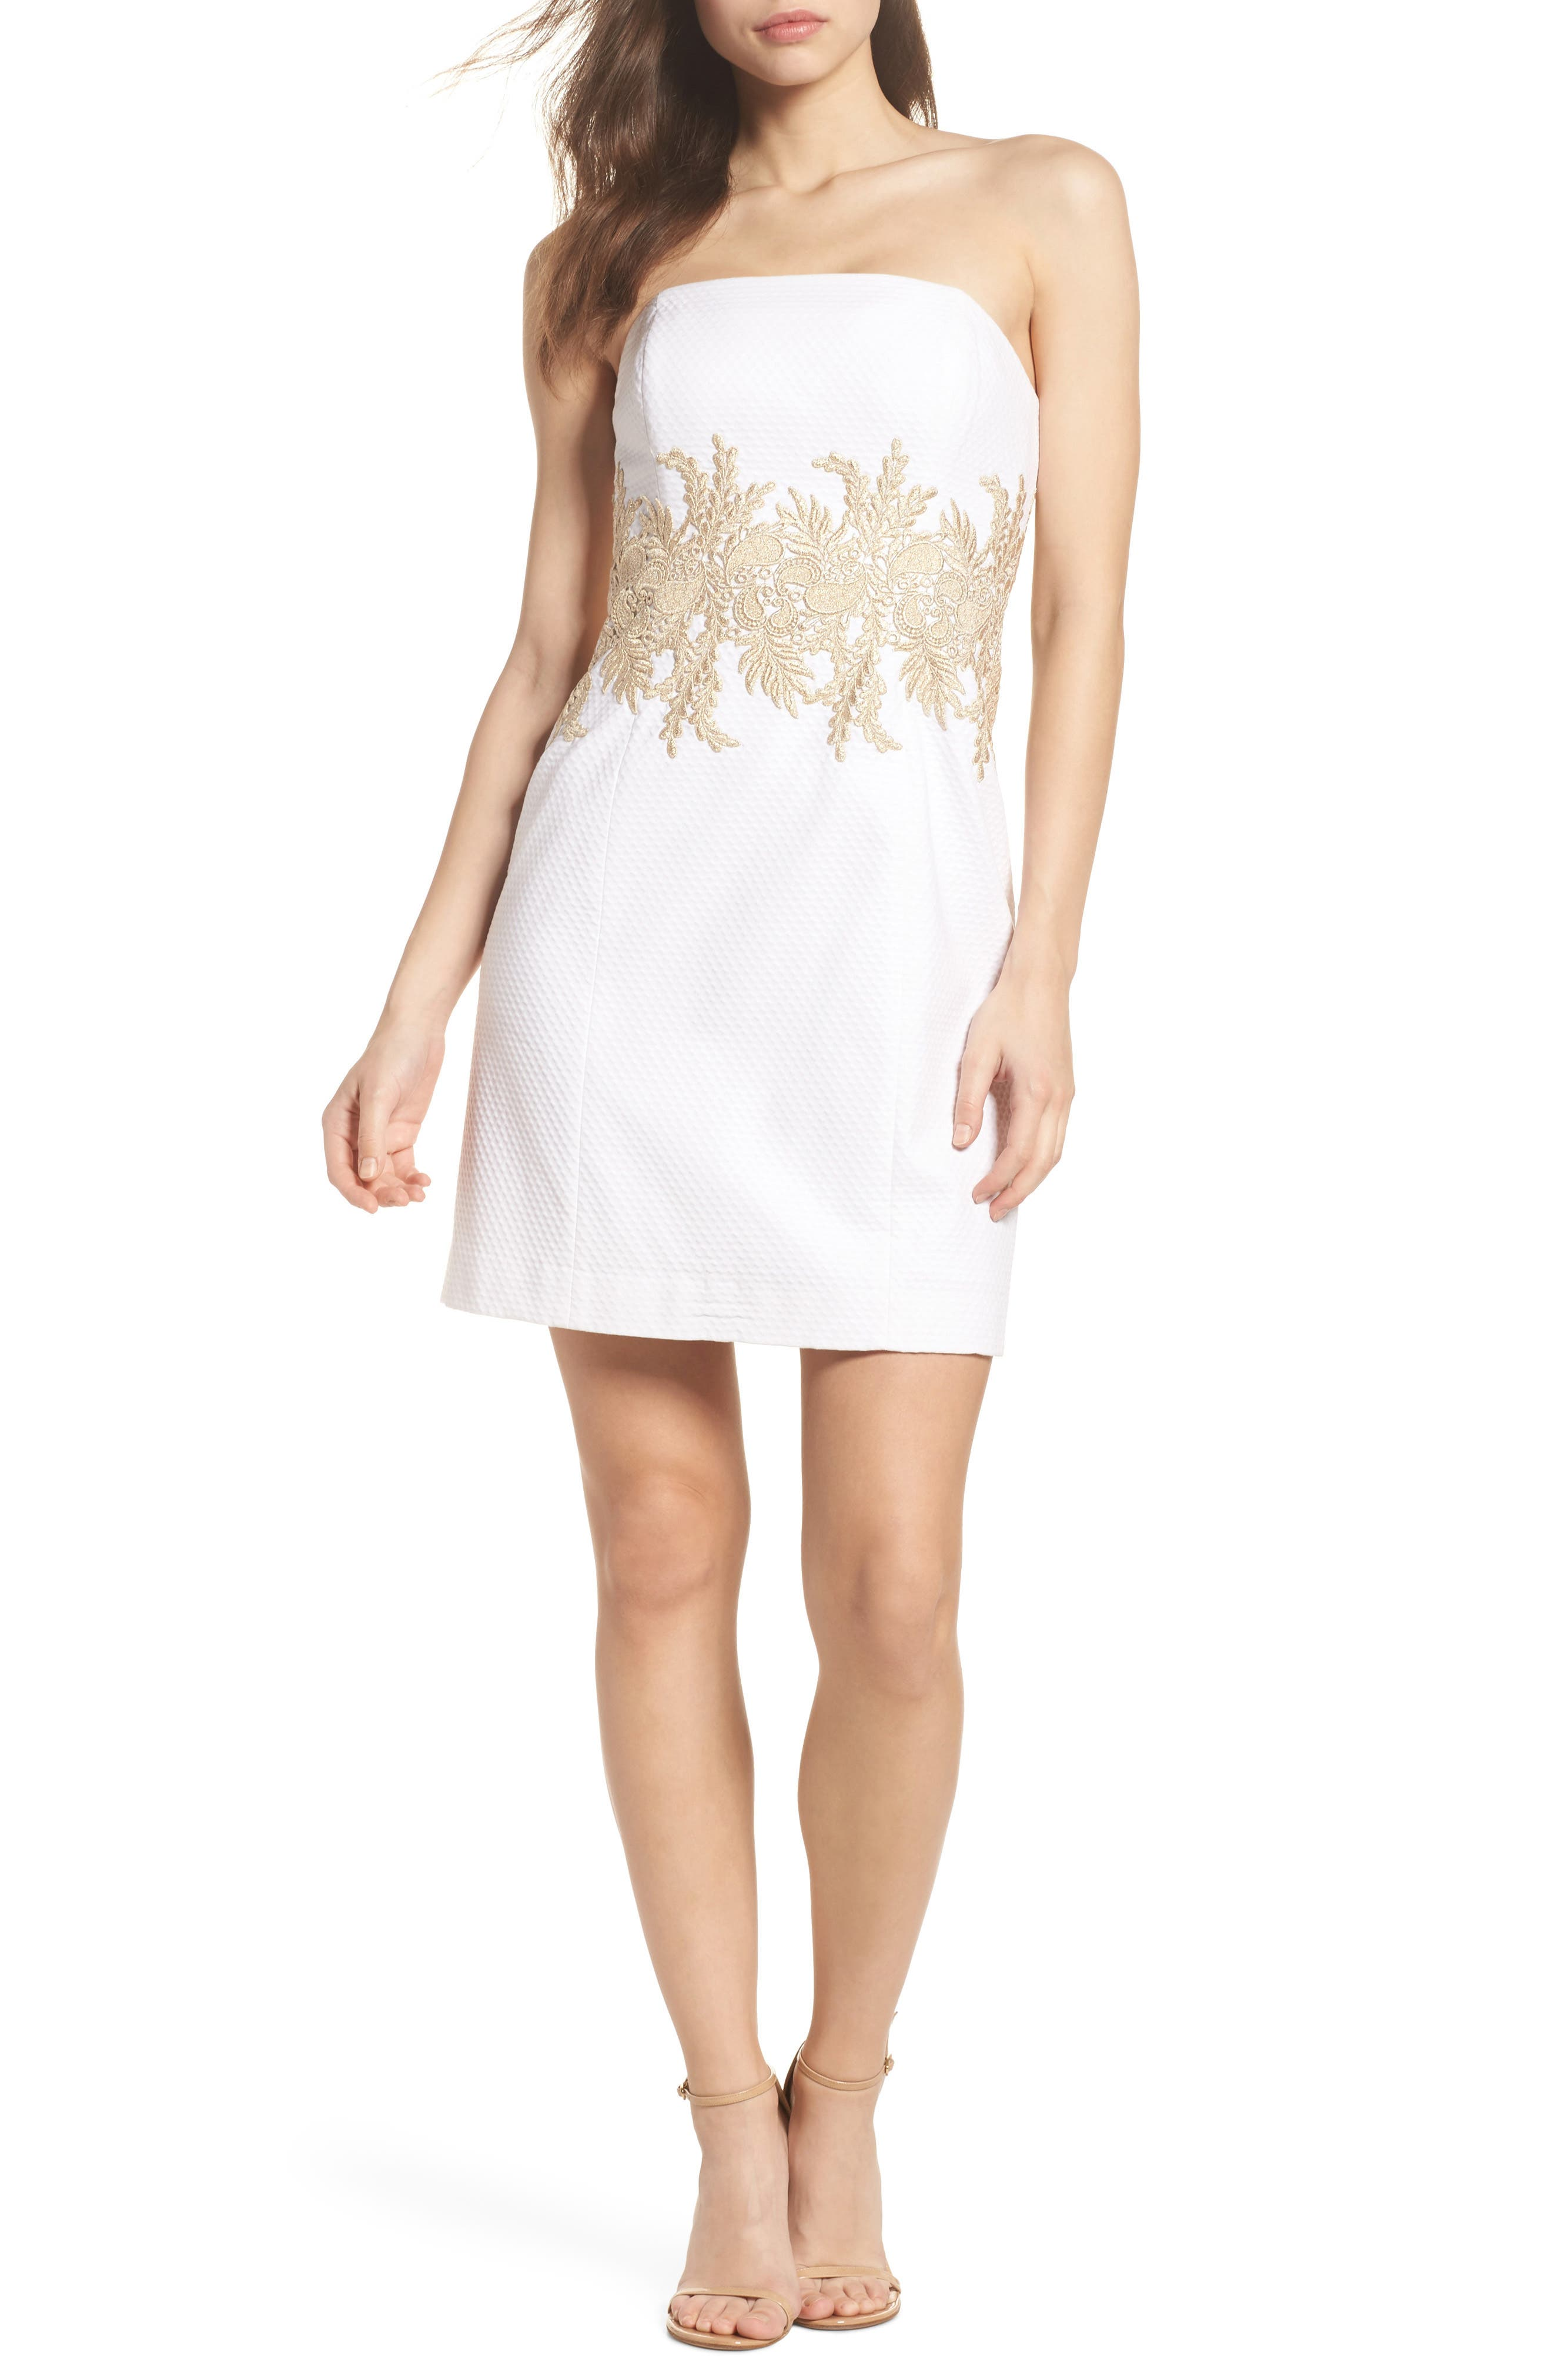 Kade Strapless Dress,                         Main,                         color, Resort White